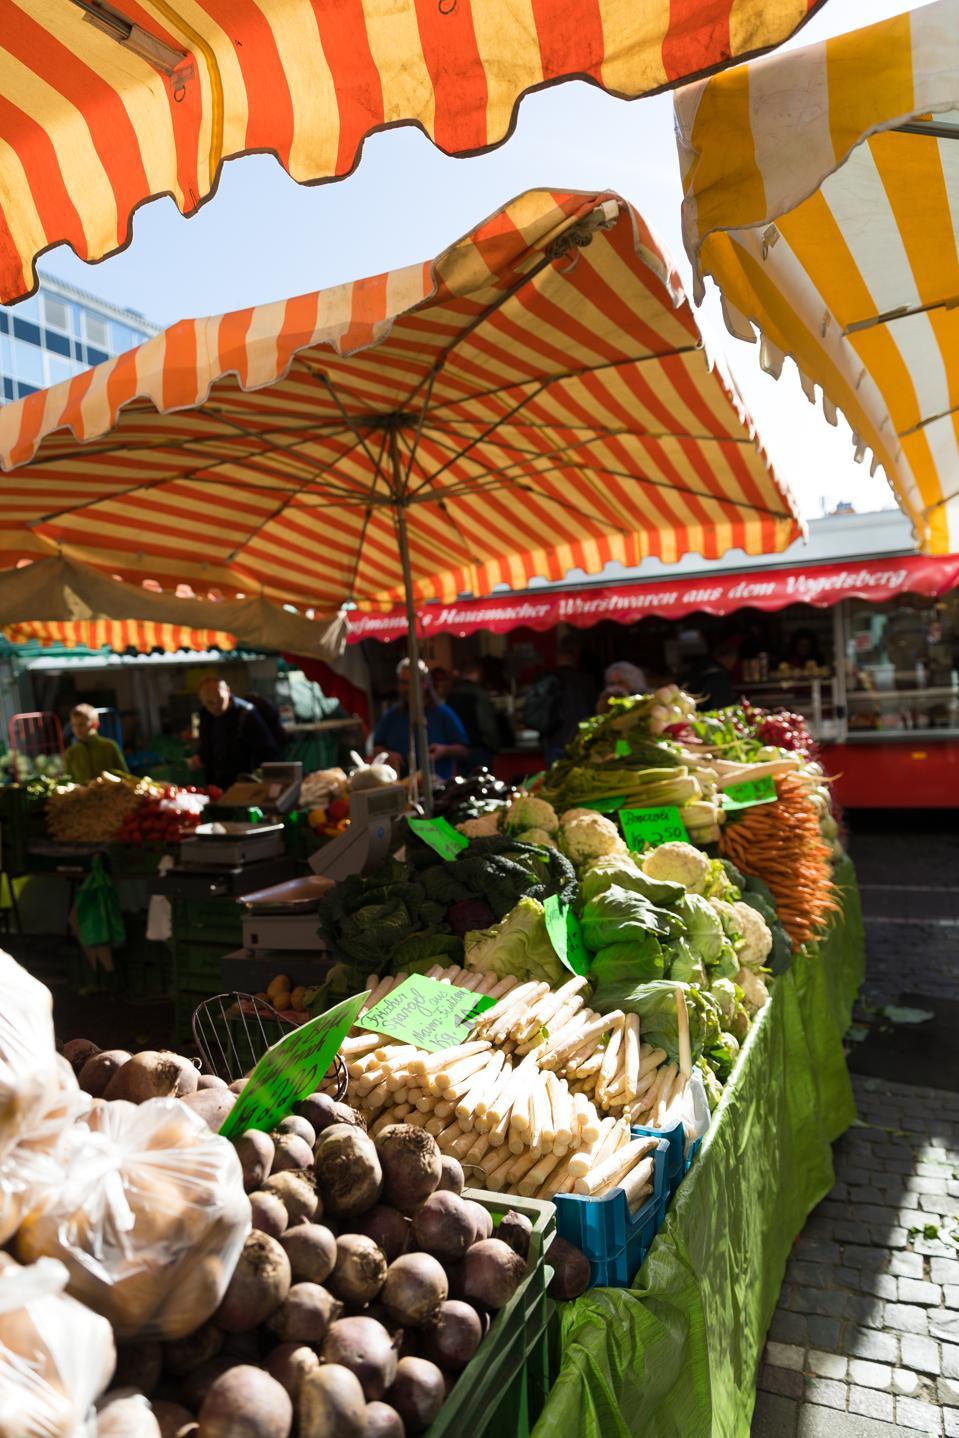 FRANKFURT, GERMANY - The weekly farmer's market in Frankfurt, Germany (April 2018)